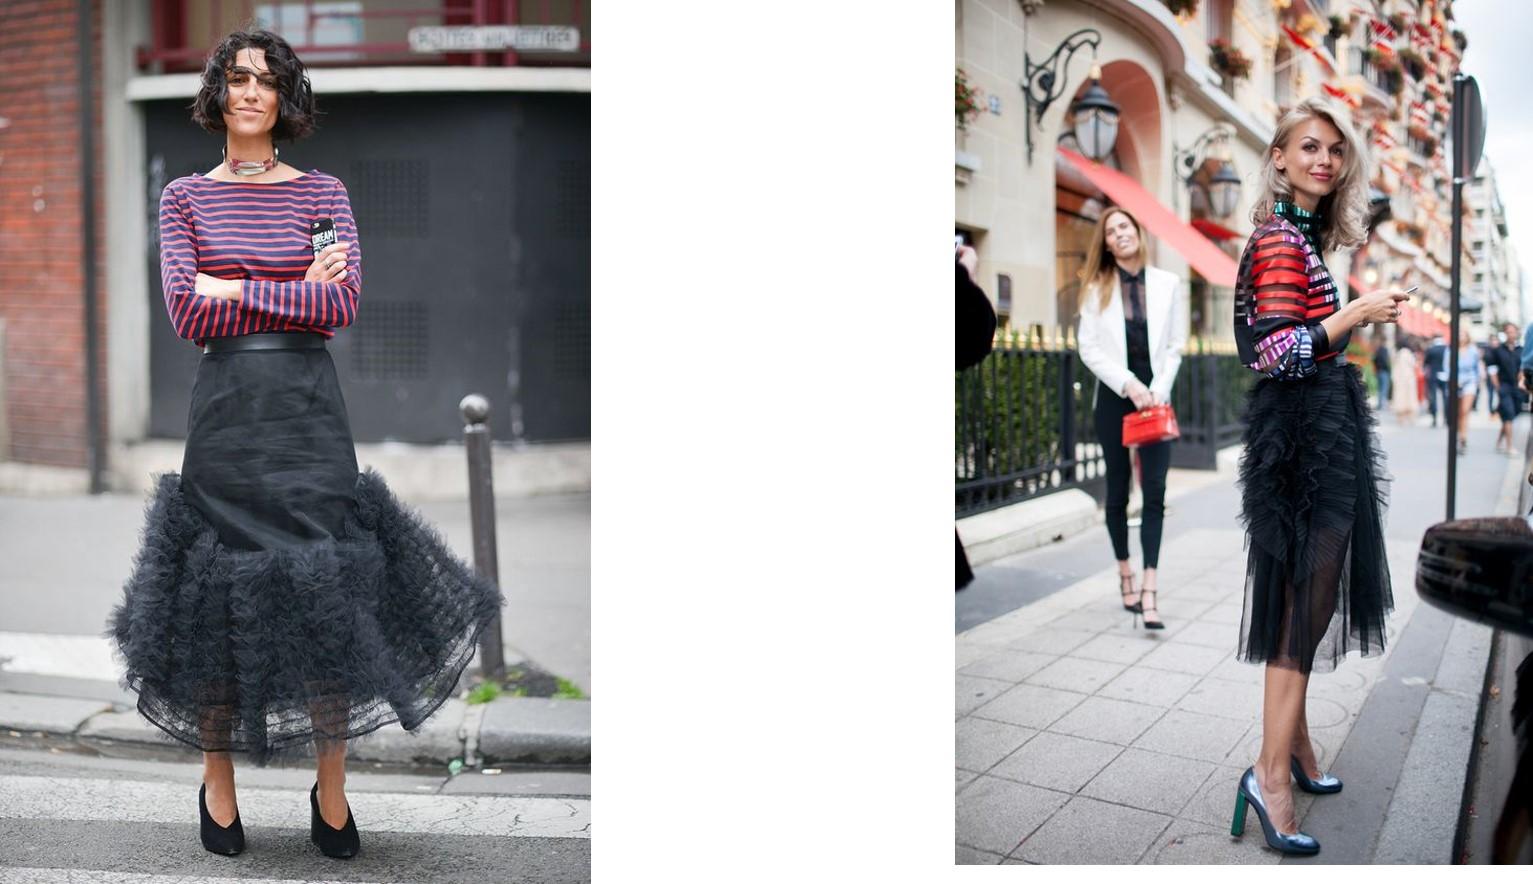 Paris fashion week & street style – Tulle fabric clothing for Paris fashion week 2017